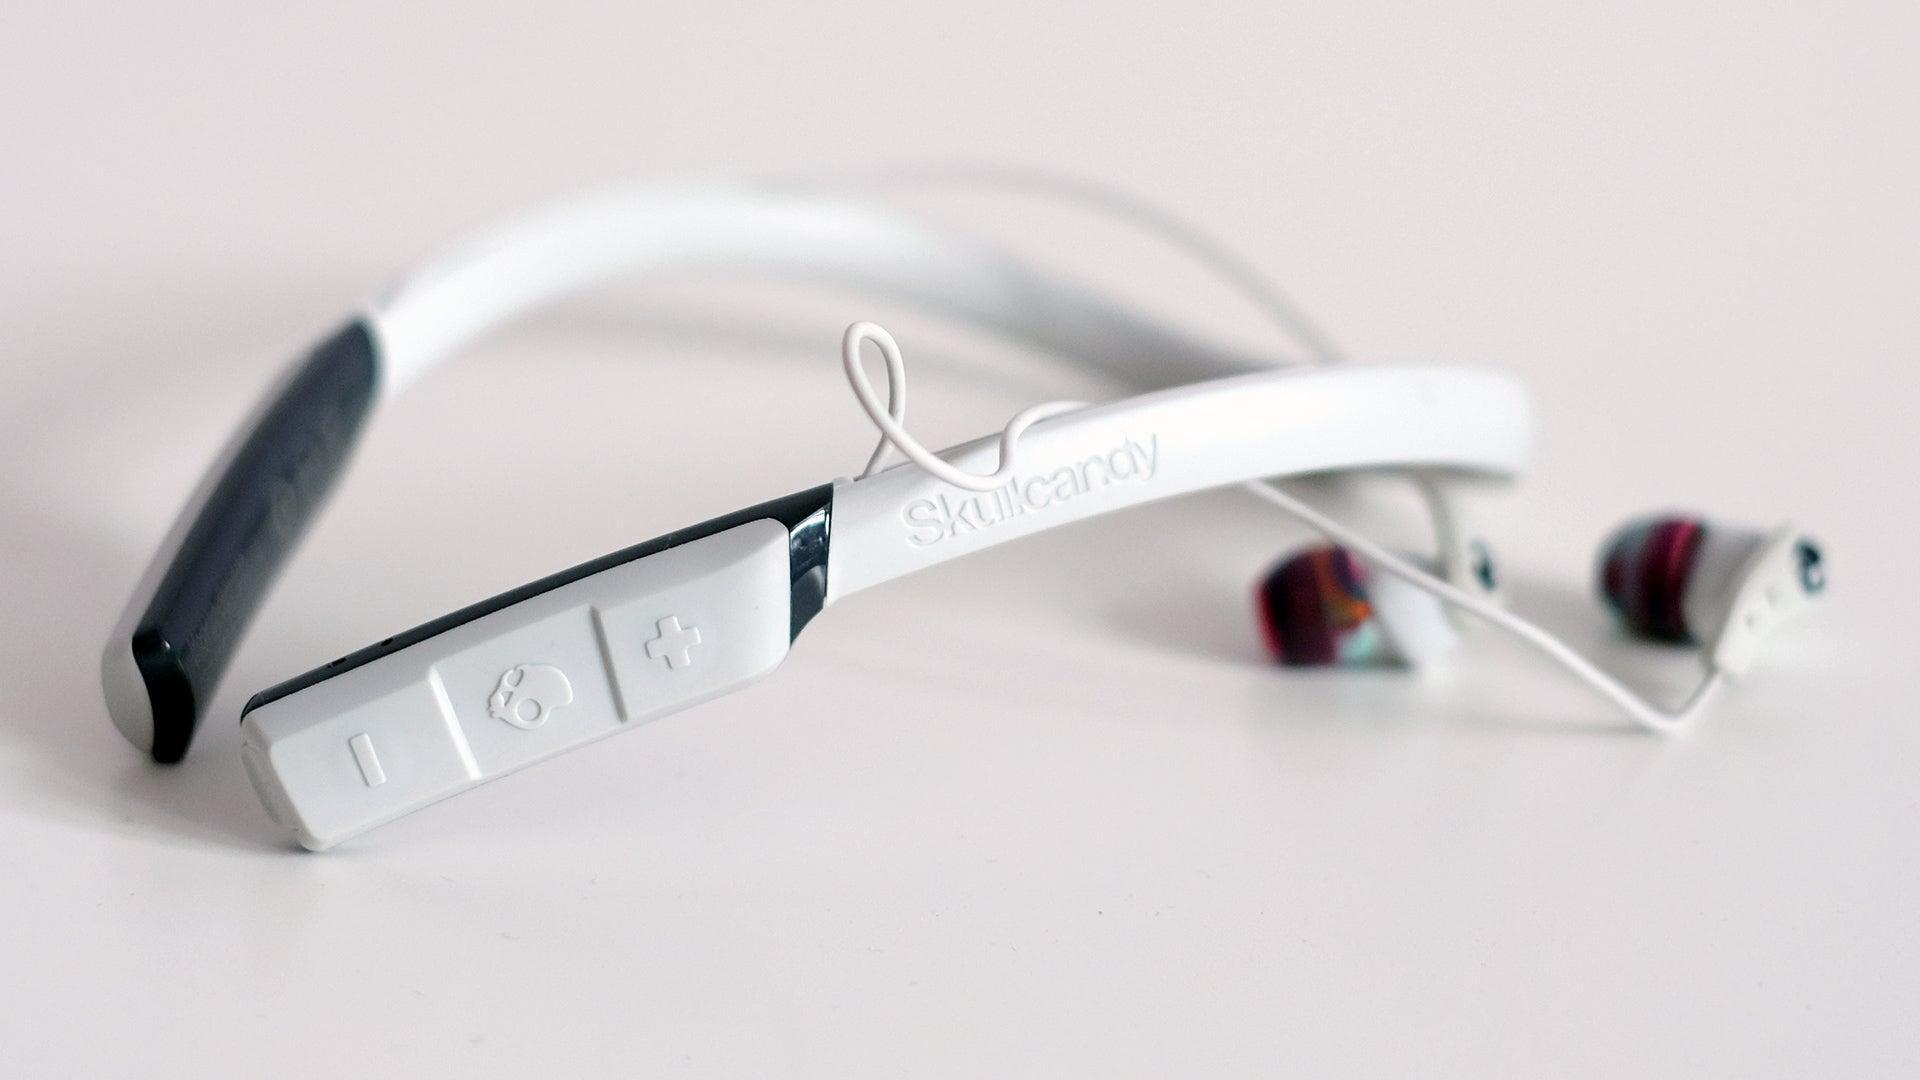 Skullcandy Method Wireless Review Trusted Reviews Headset Bluetooth Jbl X Under Armour Earphone Headphone Handsfree